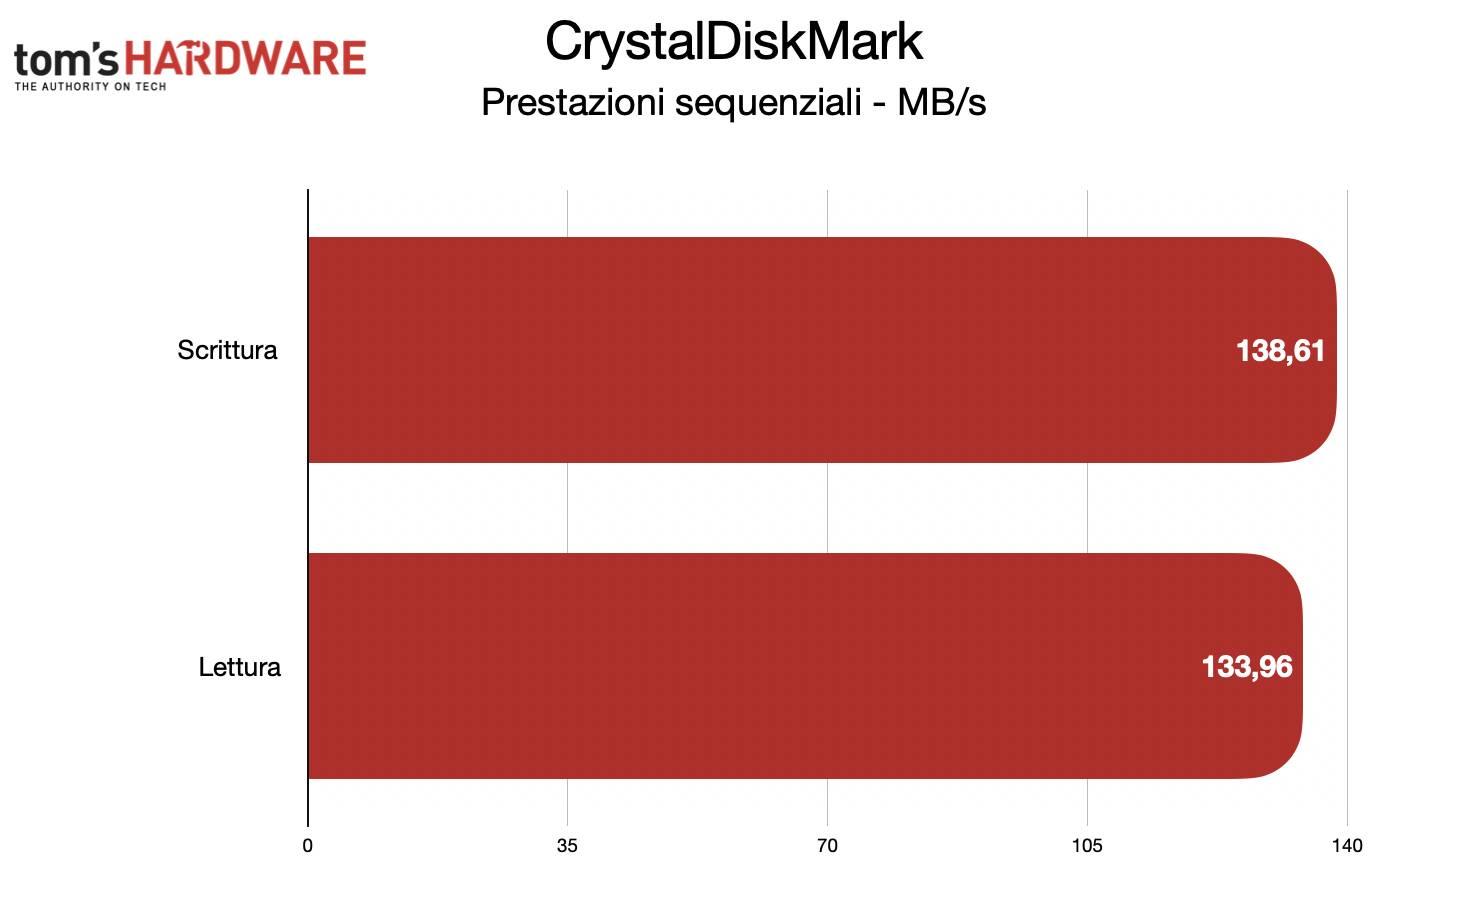 Benchmark Toshiba Canvio Gaming - CrystalDiskMark sequenziale